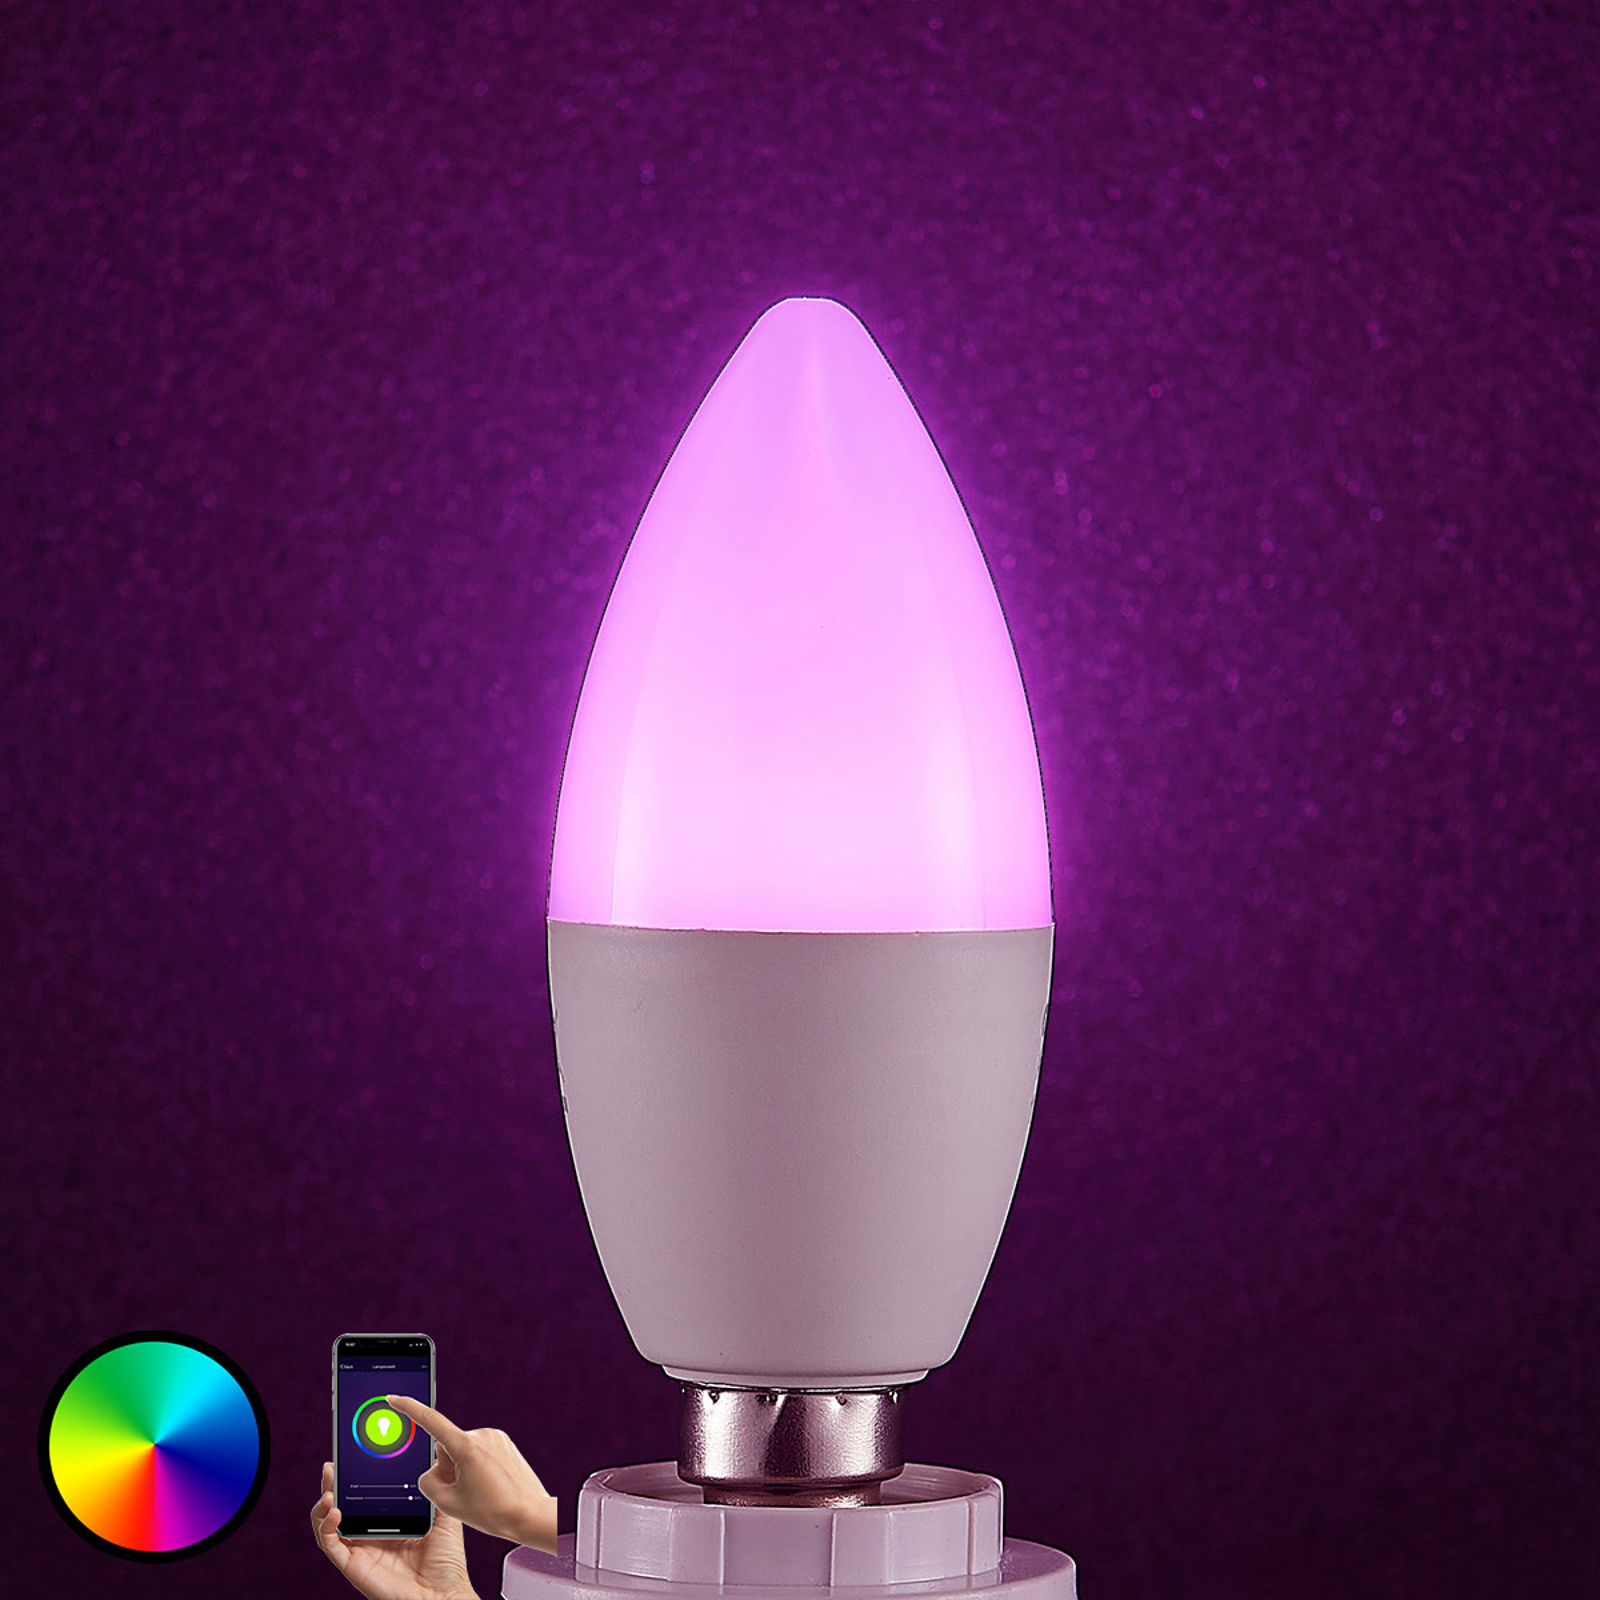 Lindby Smart LED-lamppu E14 4,5 W RGB kynttilä